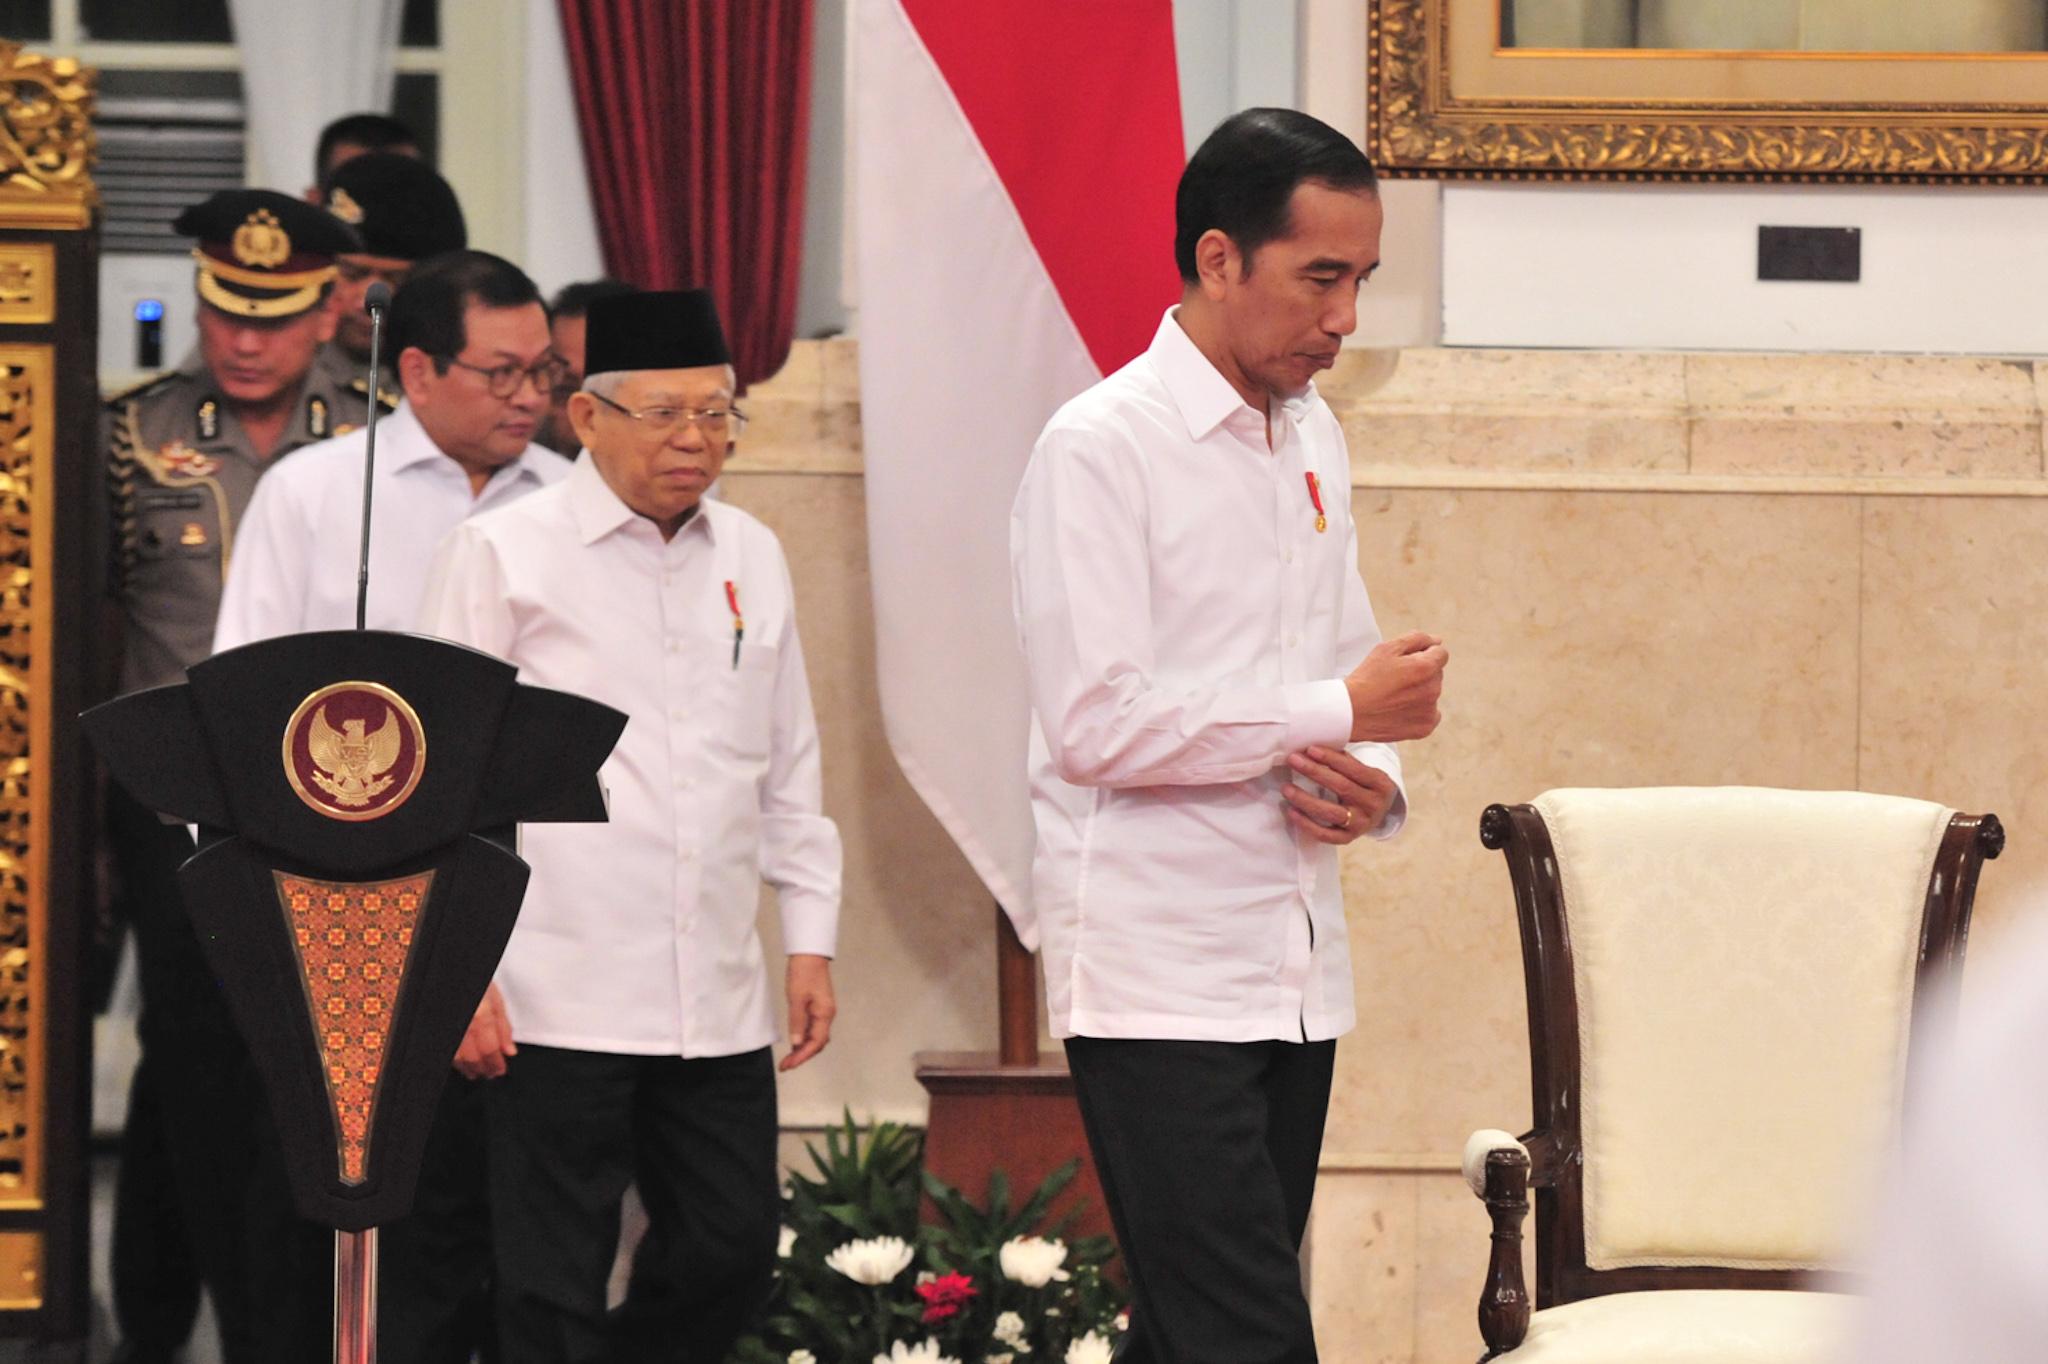 Presiden Jokowi Perintahkan Semua Kementerian Turun ke Bawah Bantu Korban Banjir